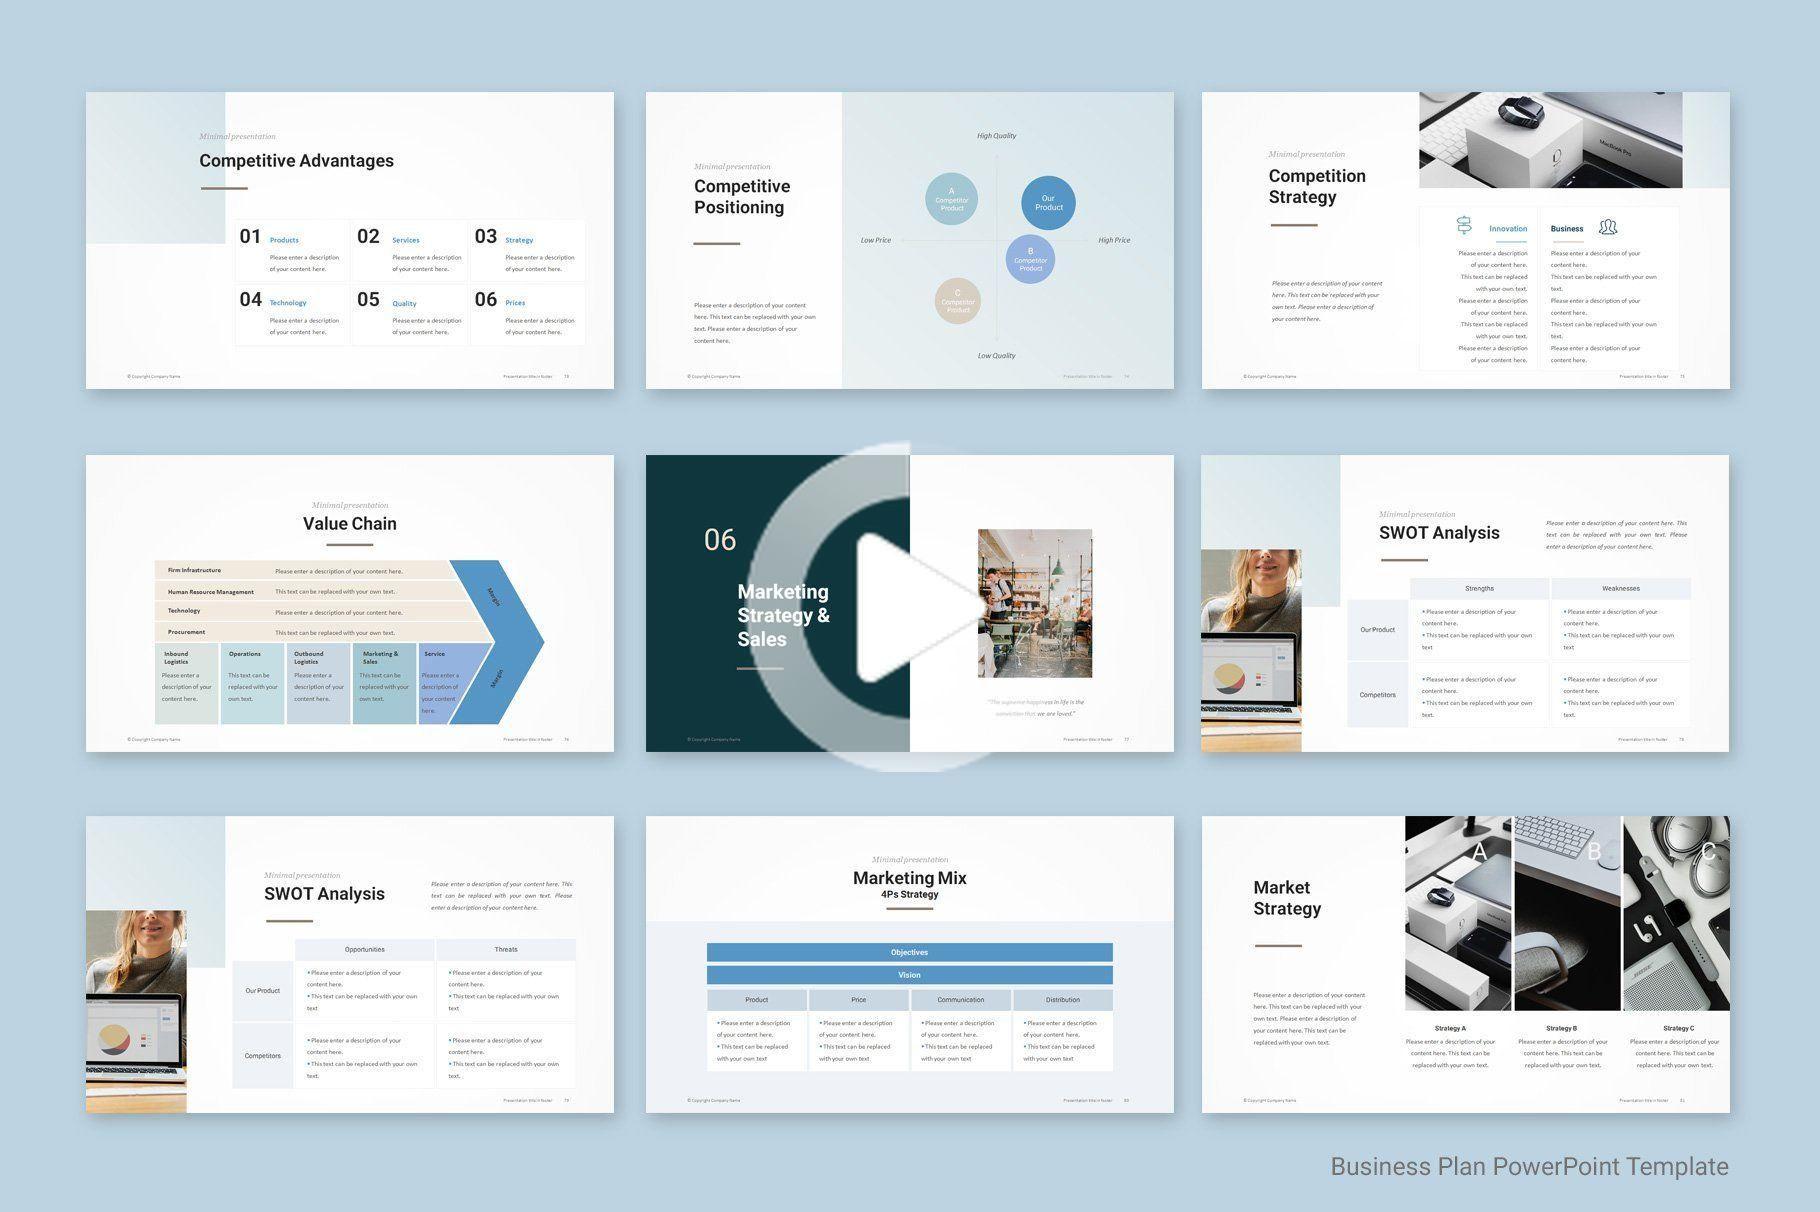 Business Plan PowerPoint 2019 , sponsored, ModelTarget